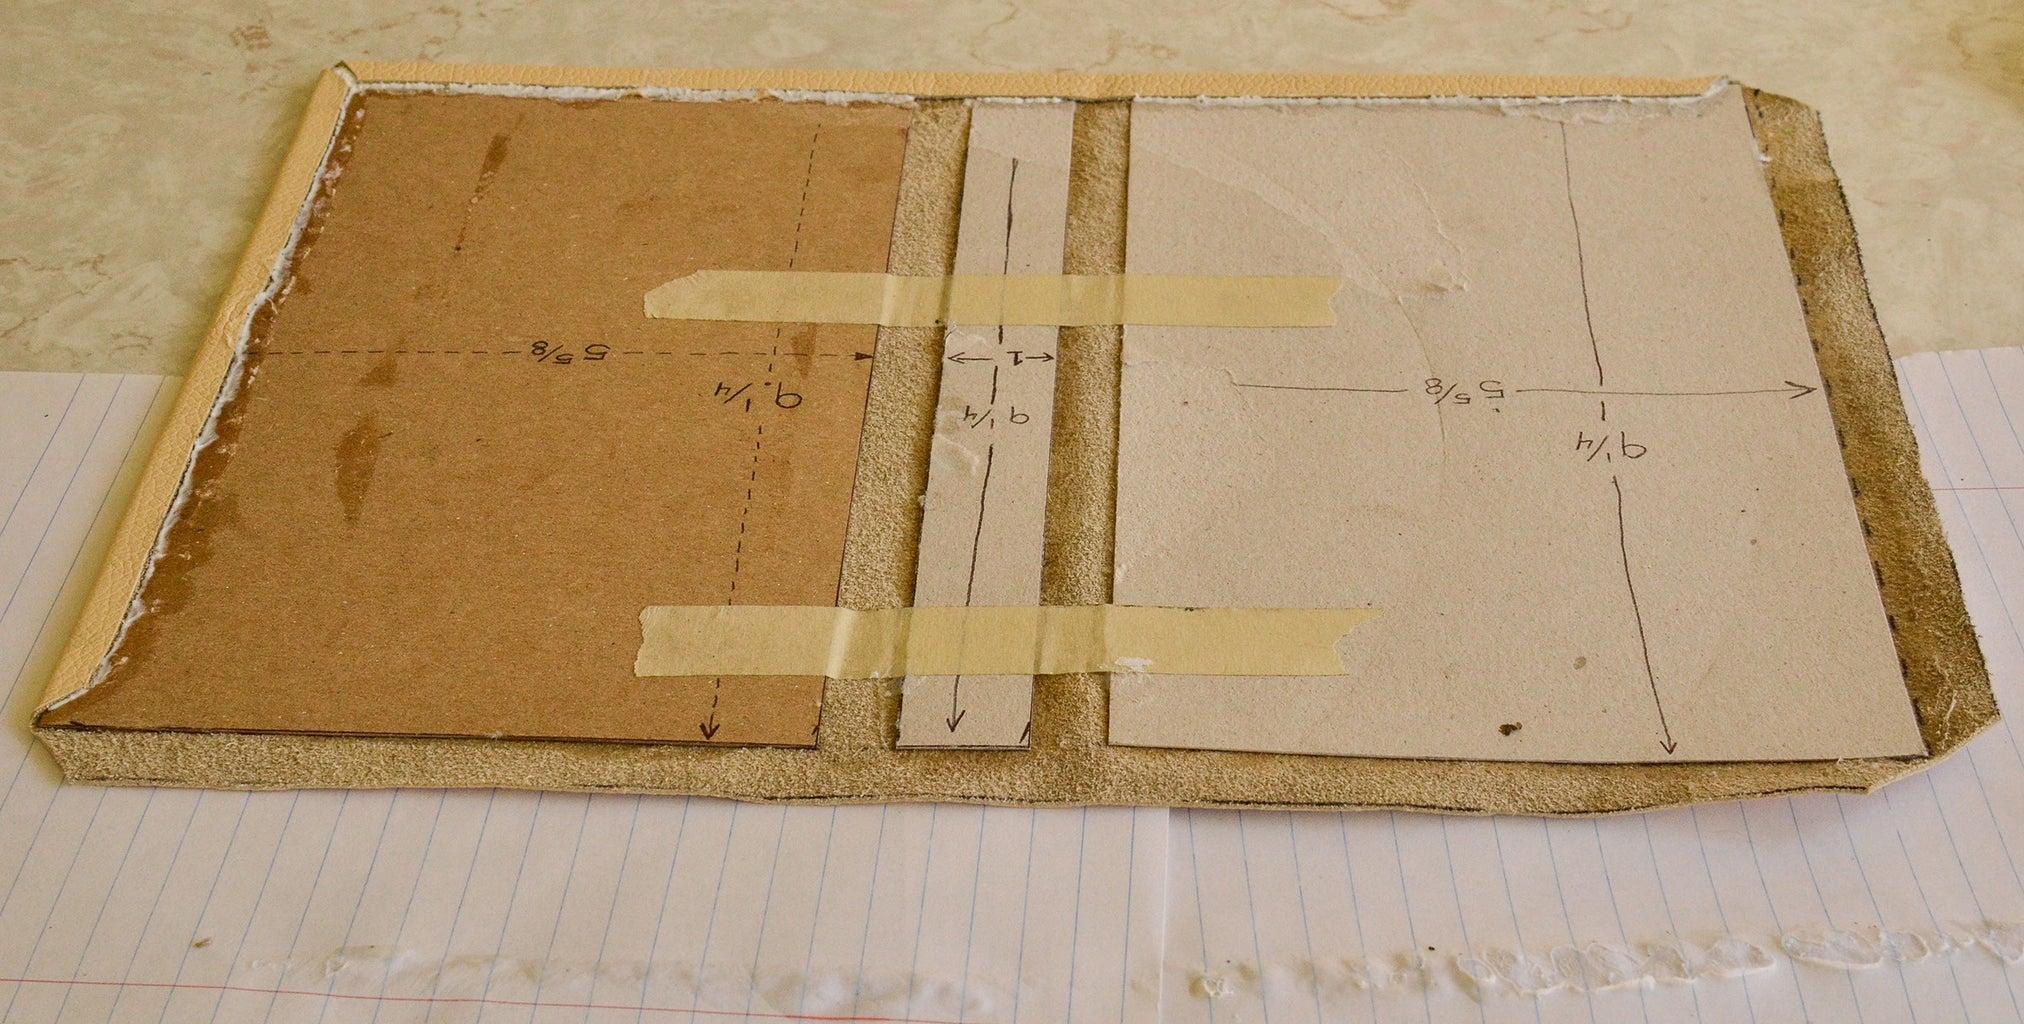 Fold and Glue the Leather Edges